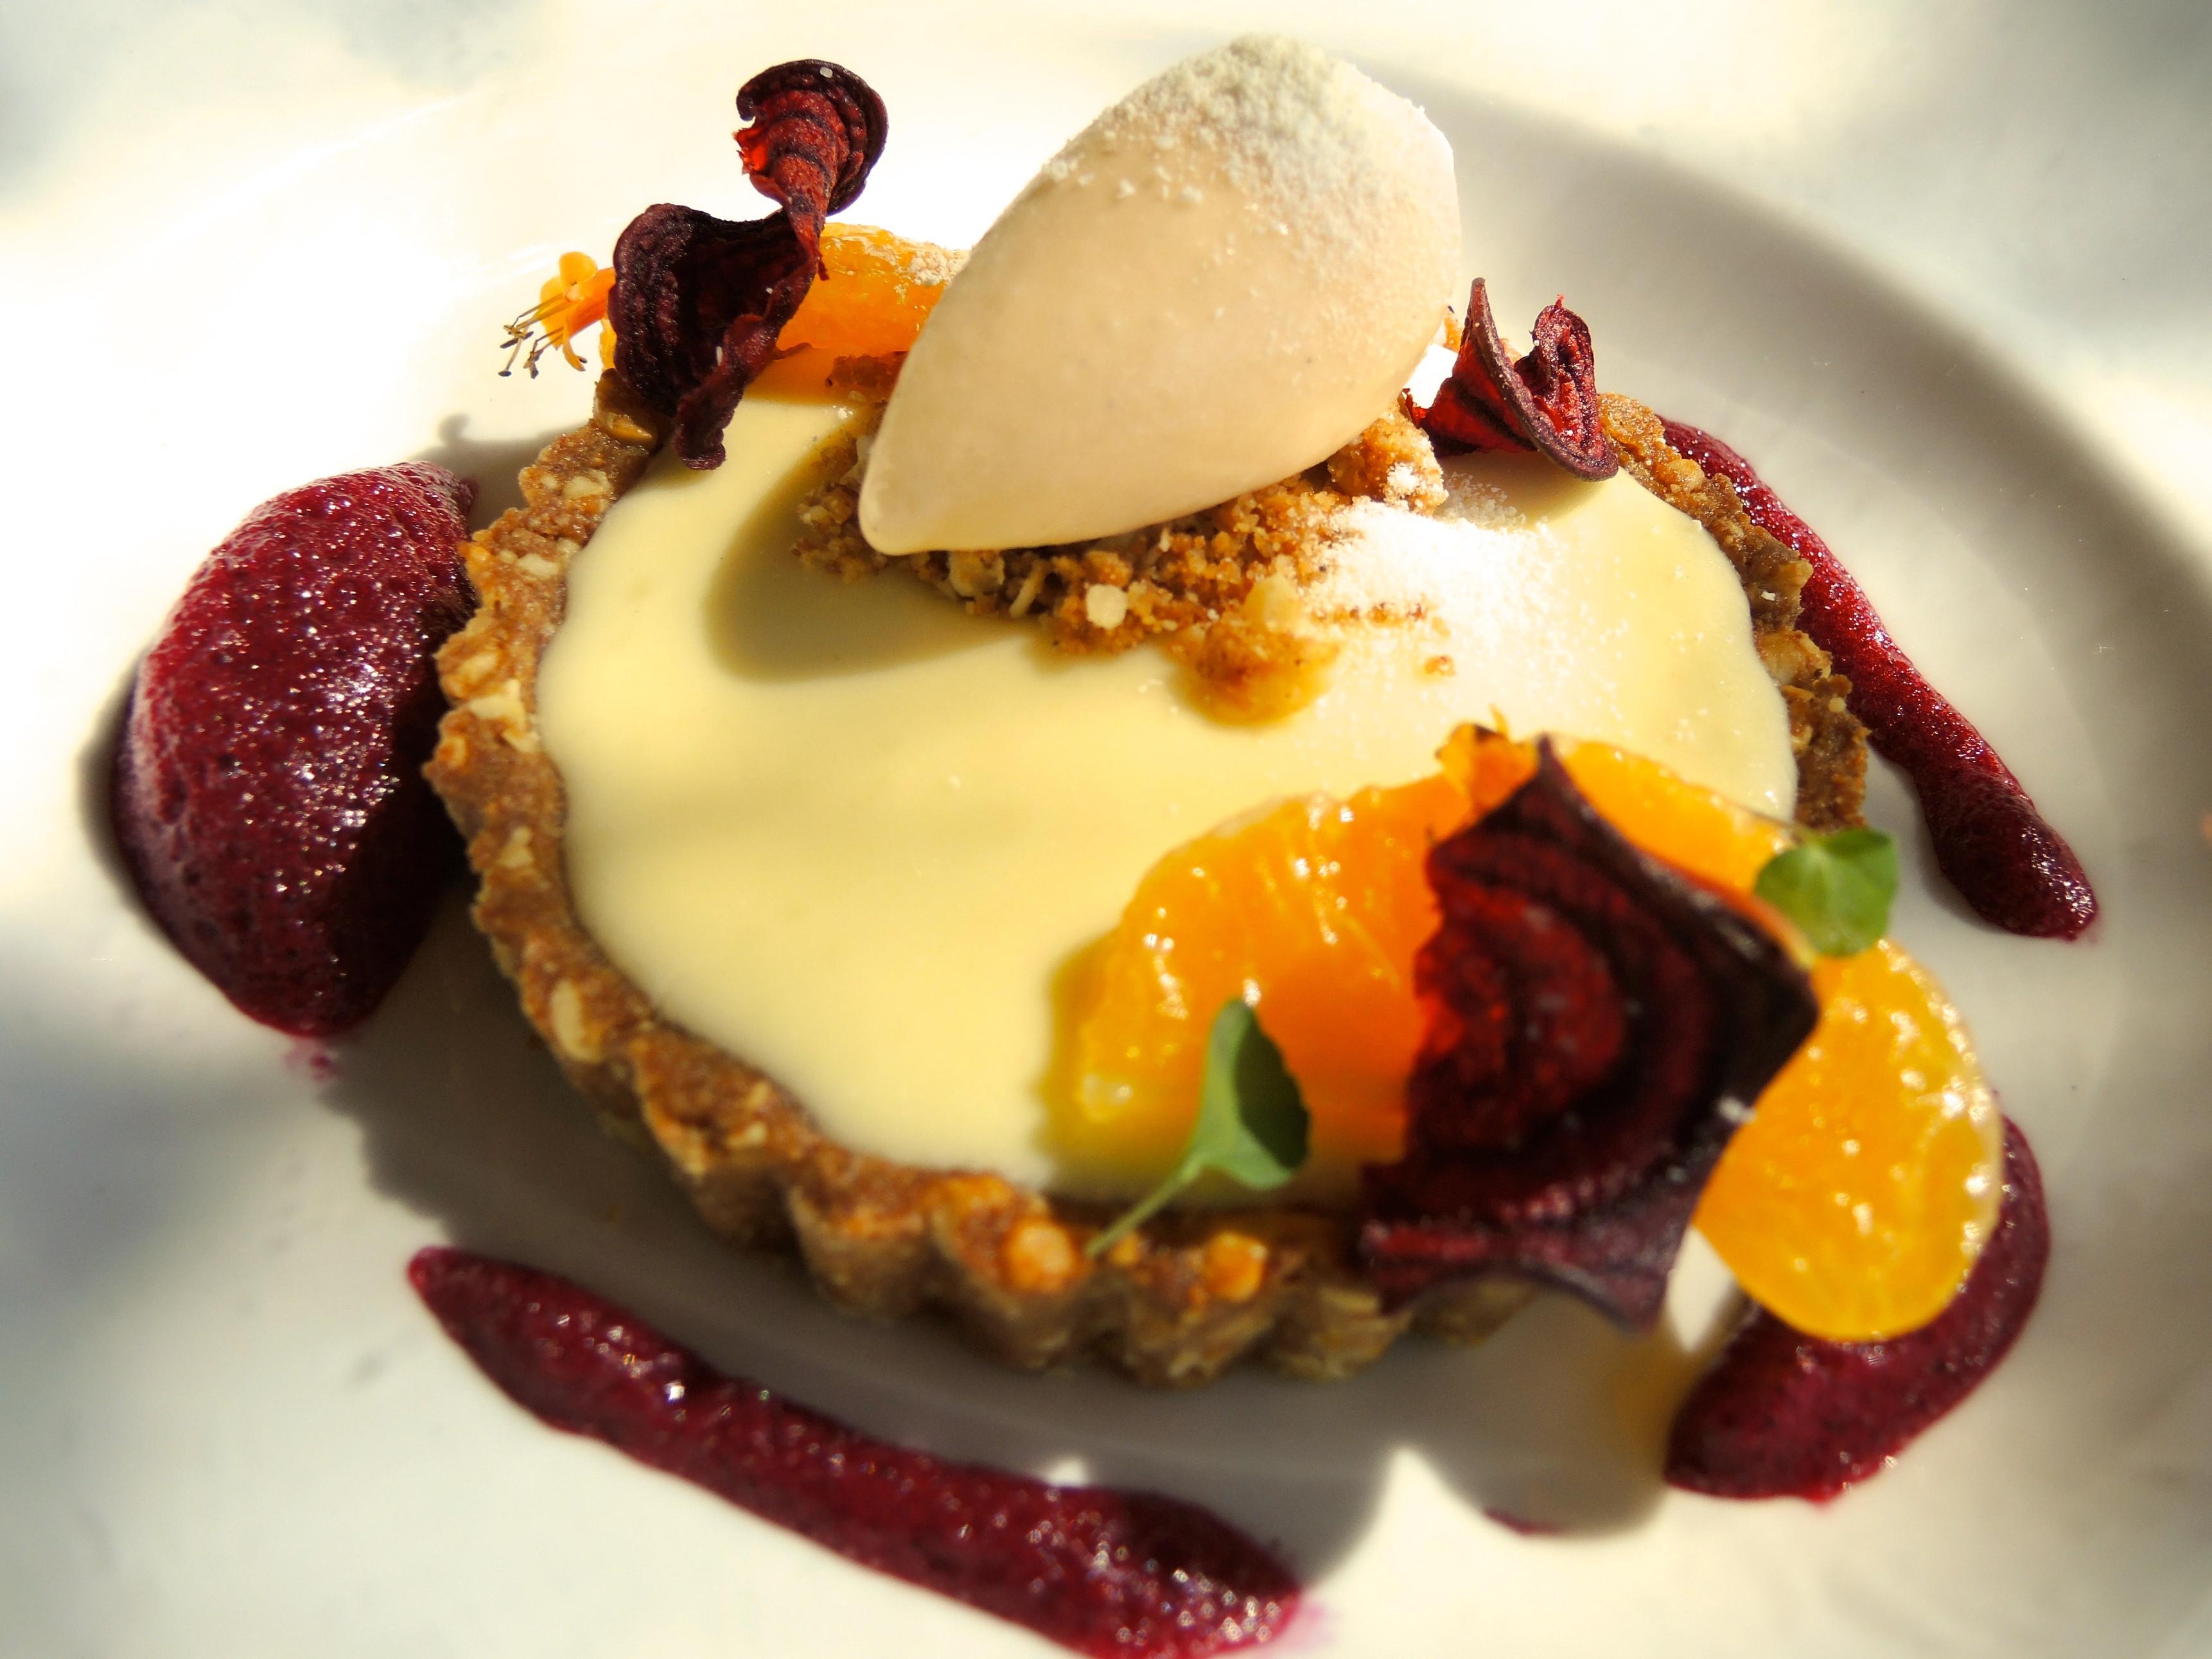 Dessert Places In Austin  Best Austin Desserts 2015 – epicuriosities